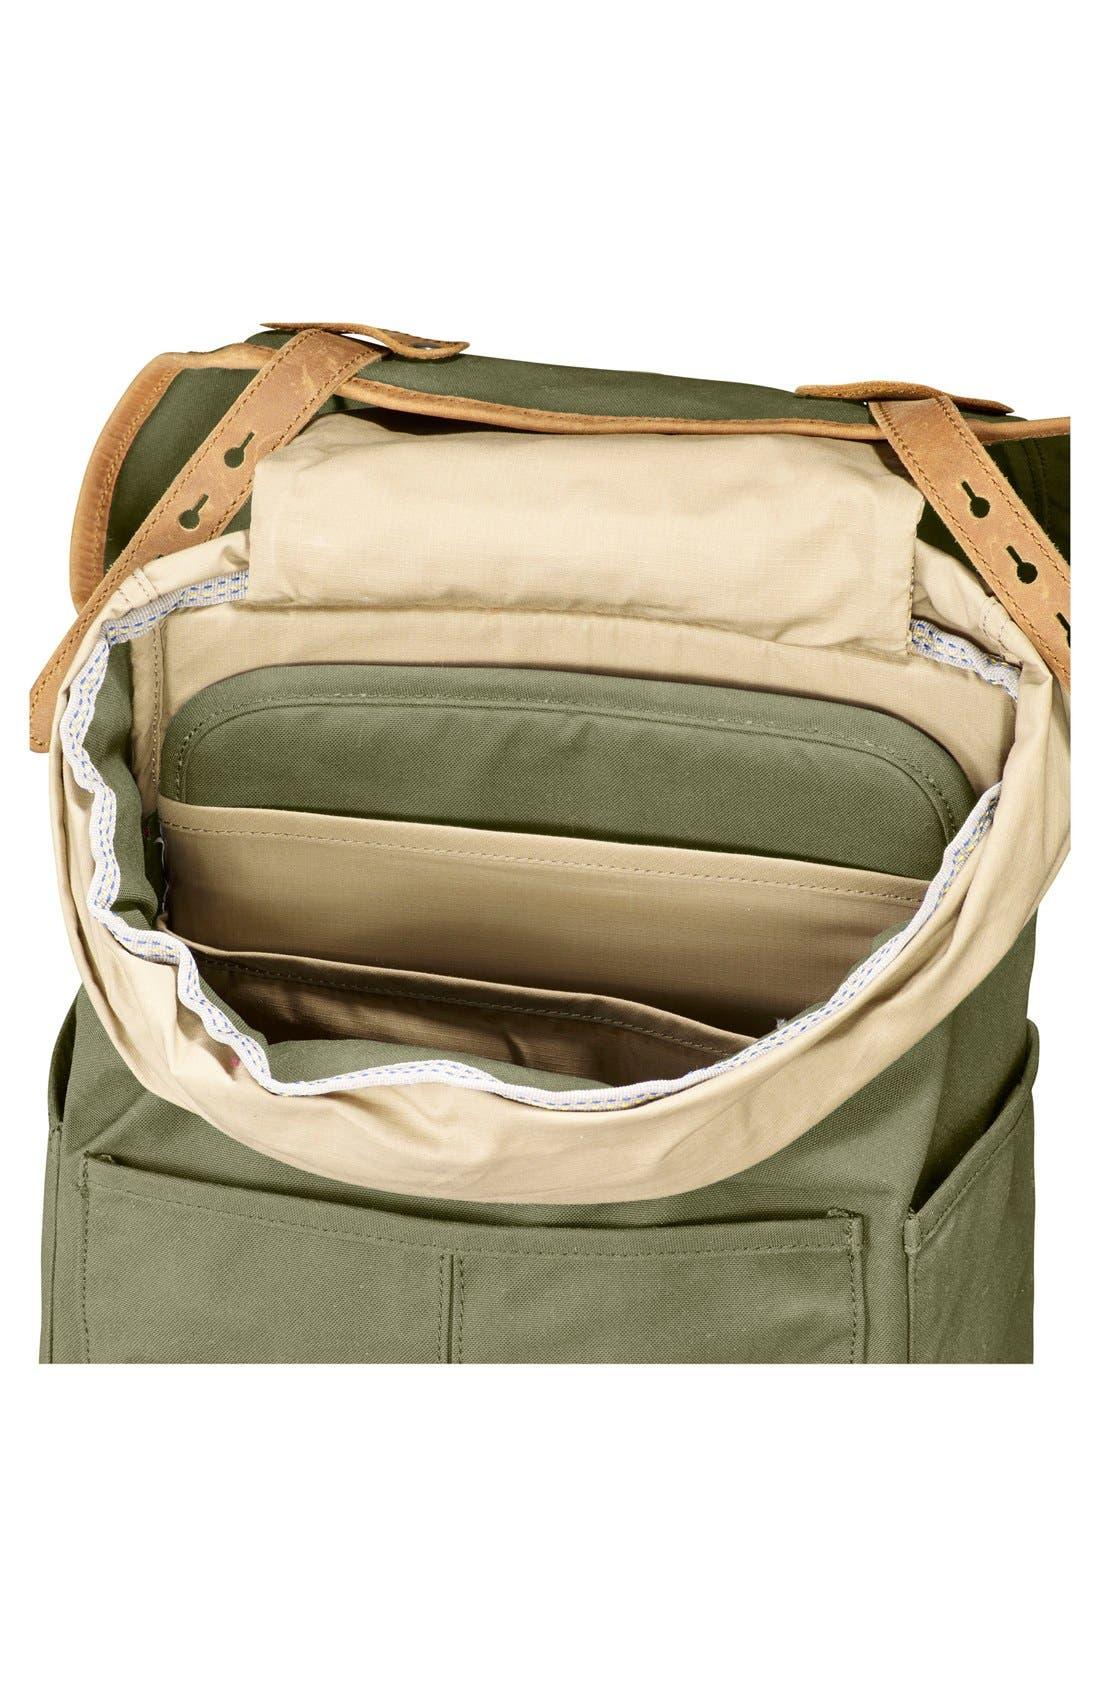 'Rucksack No. 21' Large Backpack,                             Alternate thumbnail 16, color,